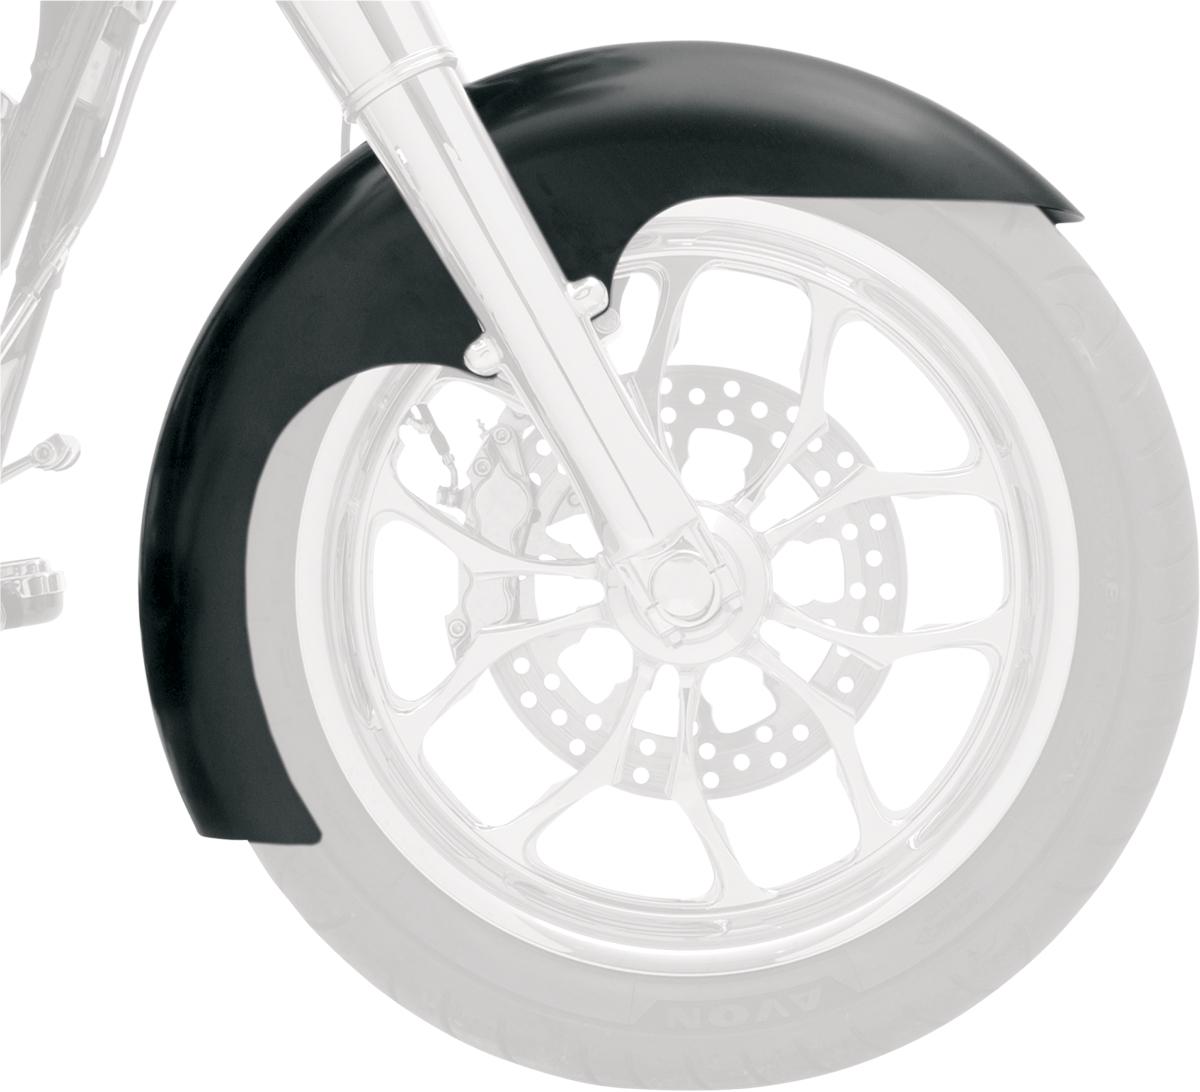 Tire Hugger Series Front Fenders w/ Mounting Blocks